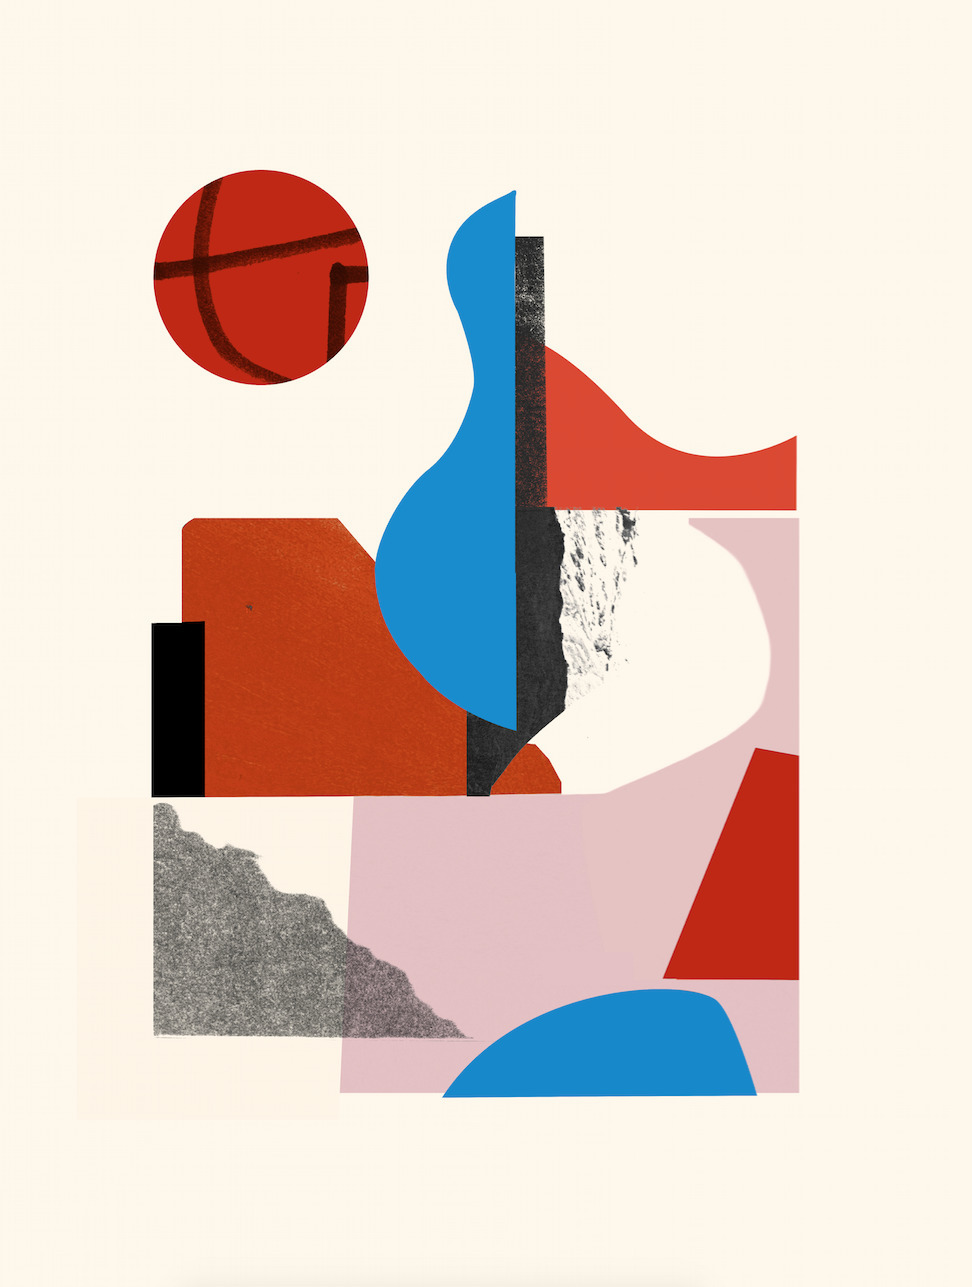 2 1 7 - abstract, elloabstract, collage - nealgallagher   ello